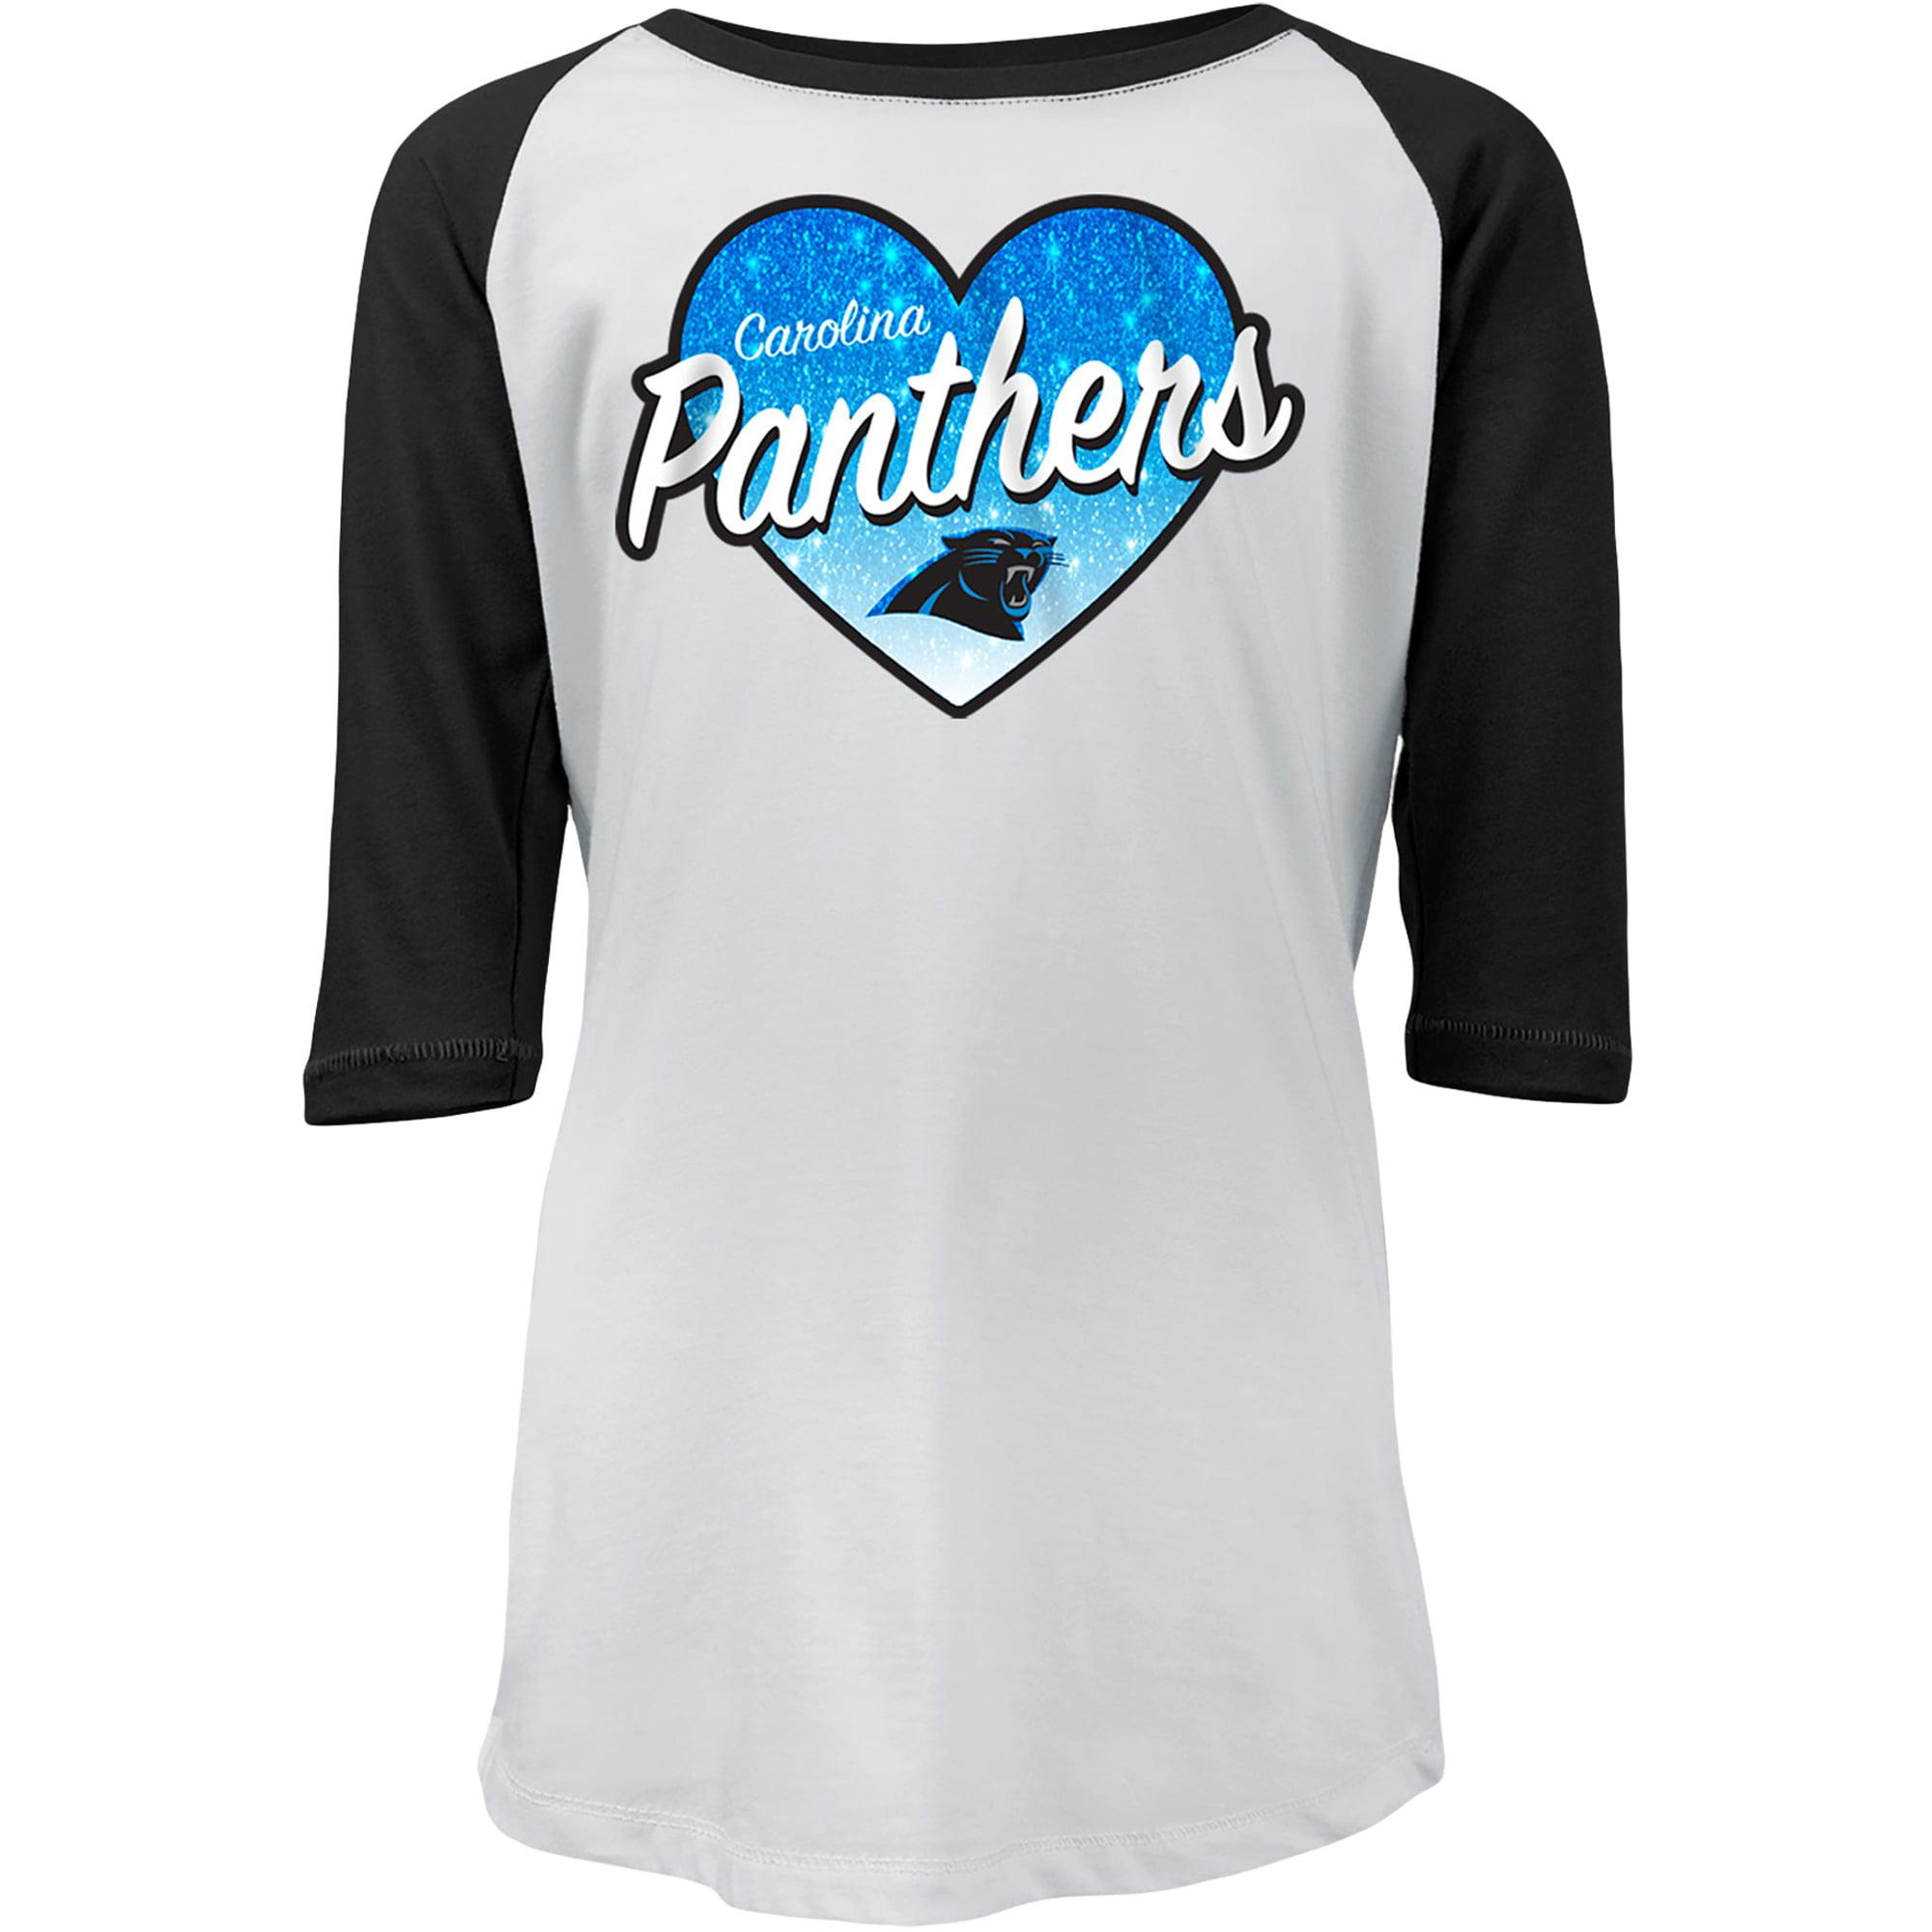 Carolina Panthers New Era Girls Youth Gradient Heart Raglan 3/4-Sleeve T-Shirt - White/Black